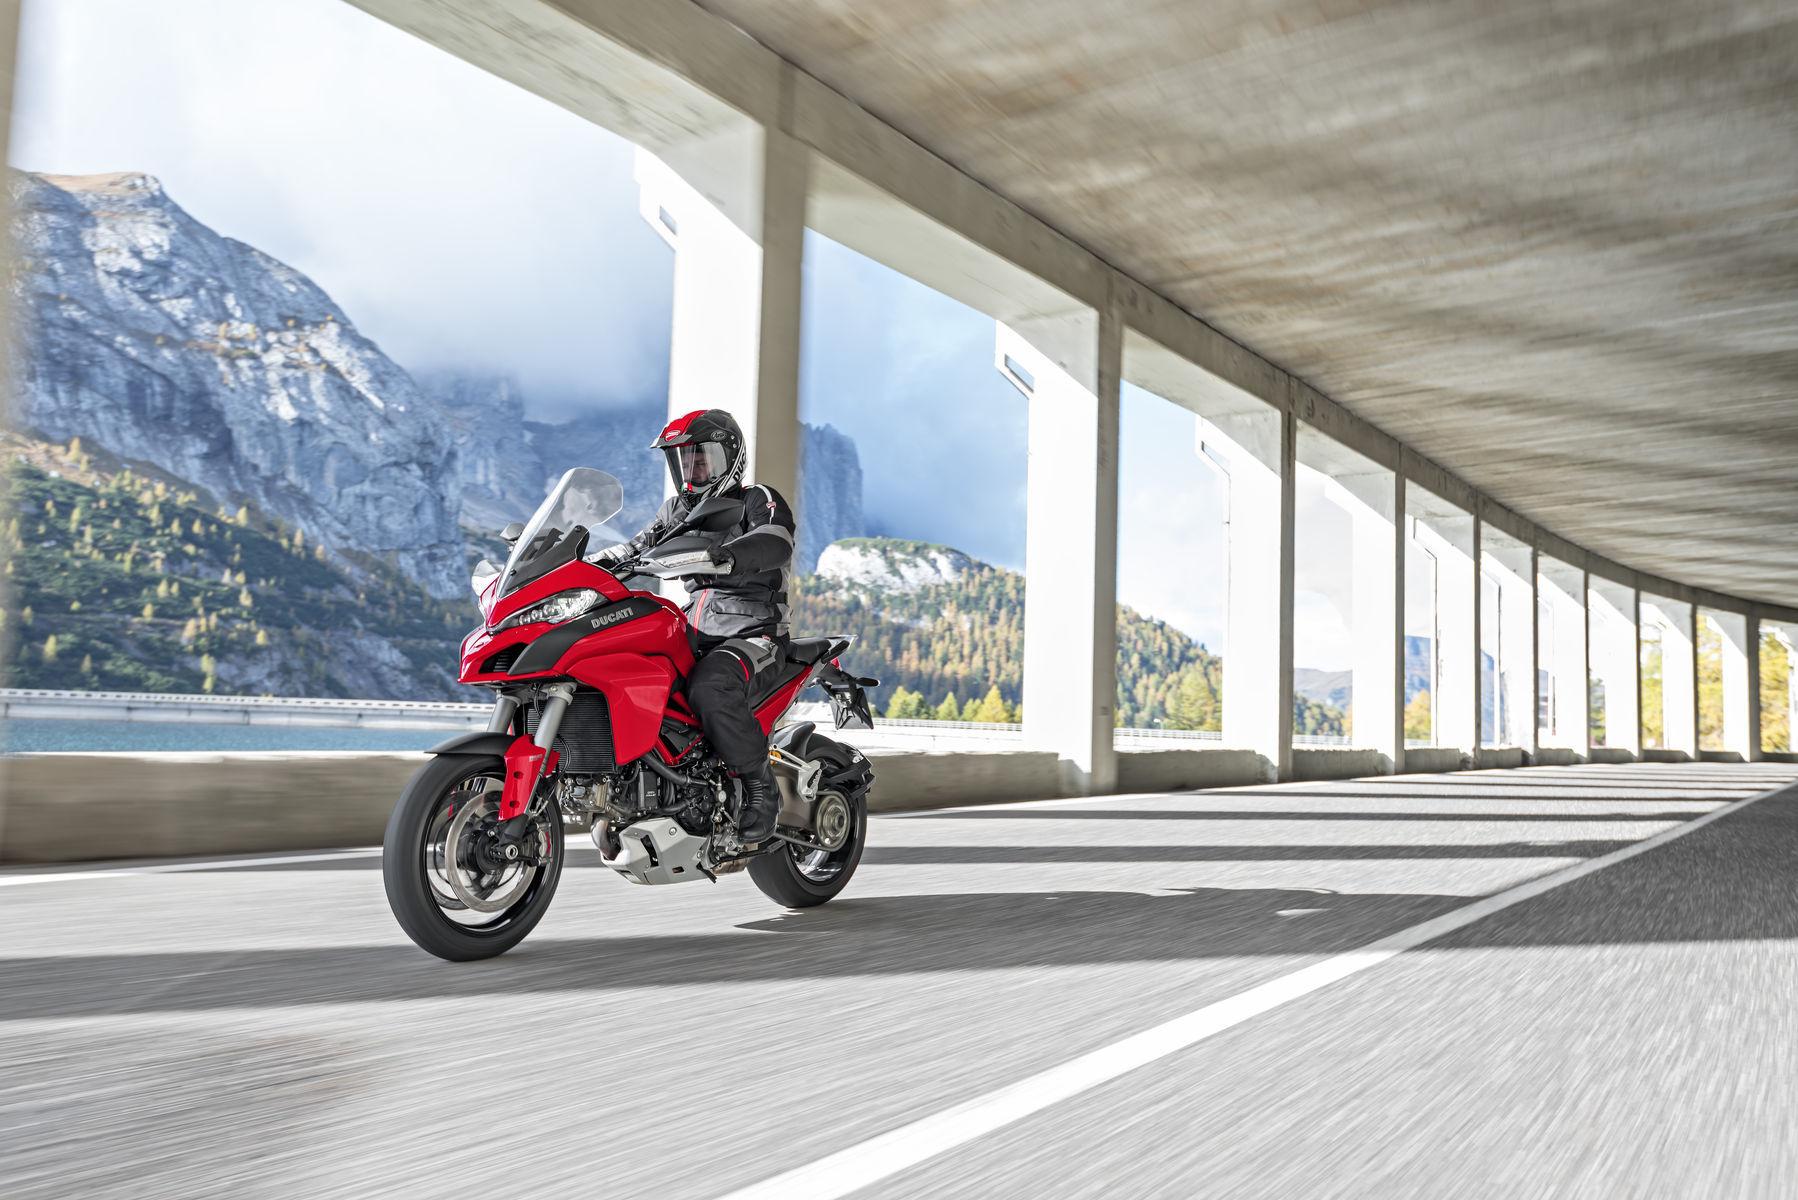 2015 Ducati Multistrada 1200 S | 2015 Multistrada 1200 S - Mountain Views